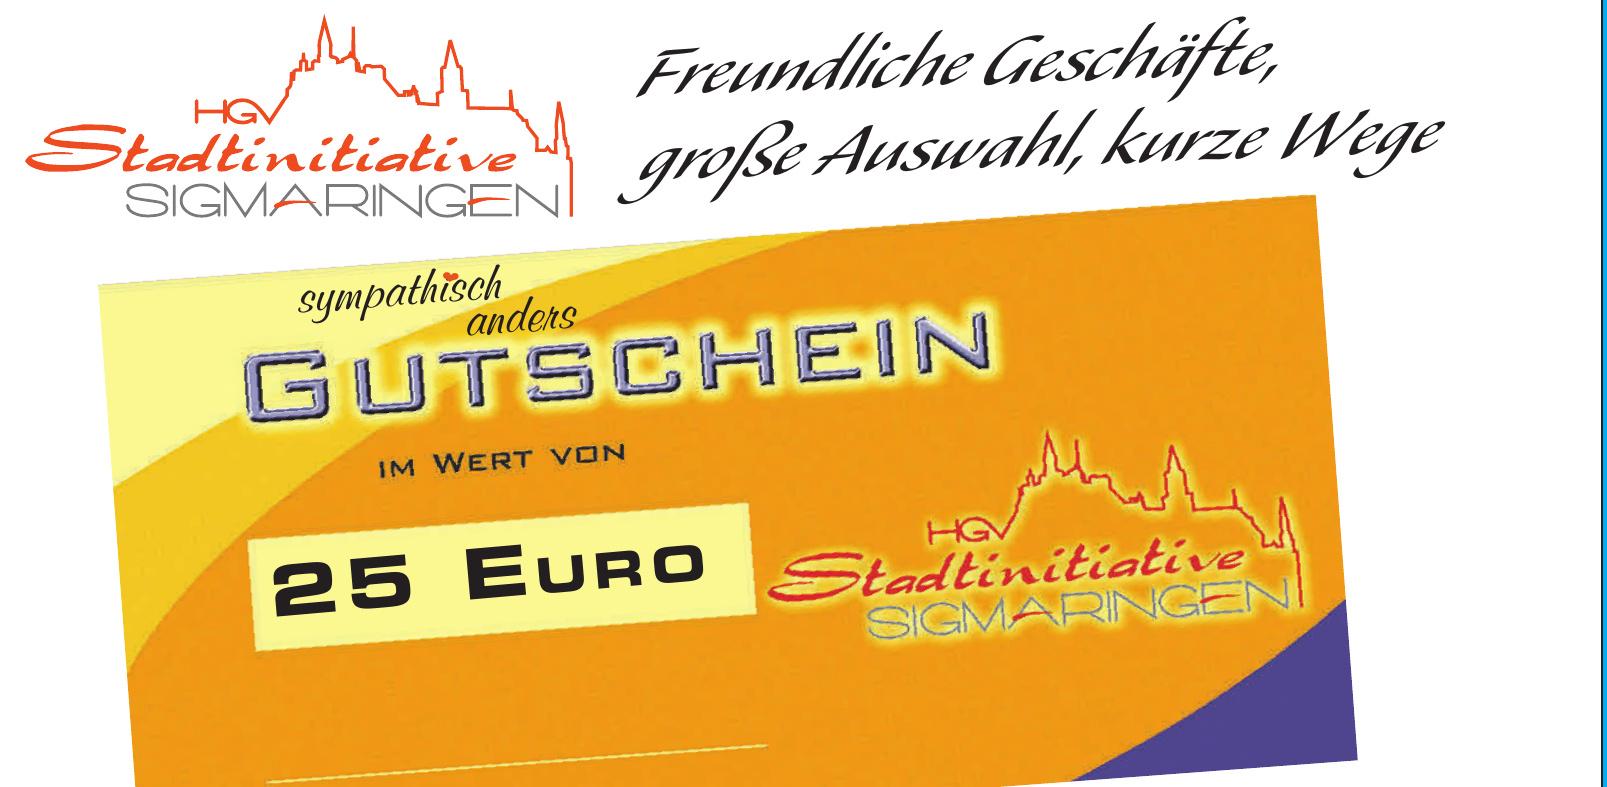 HG Stadtinitiative Sigmaringen